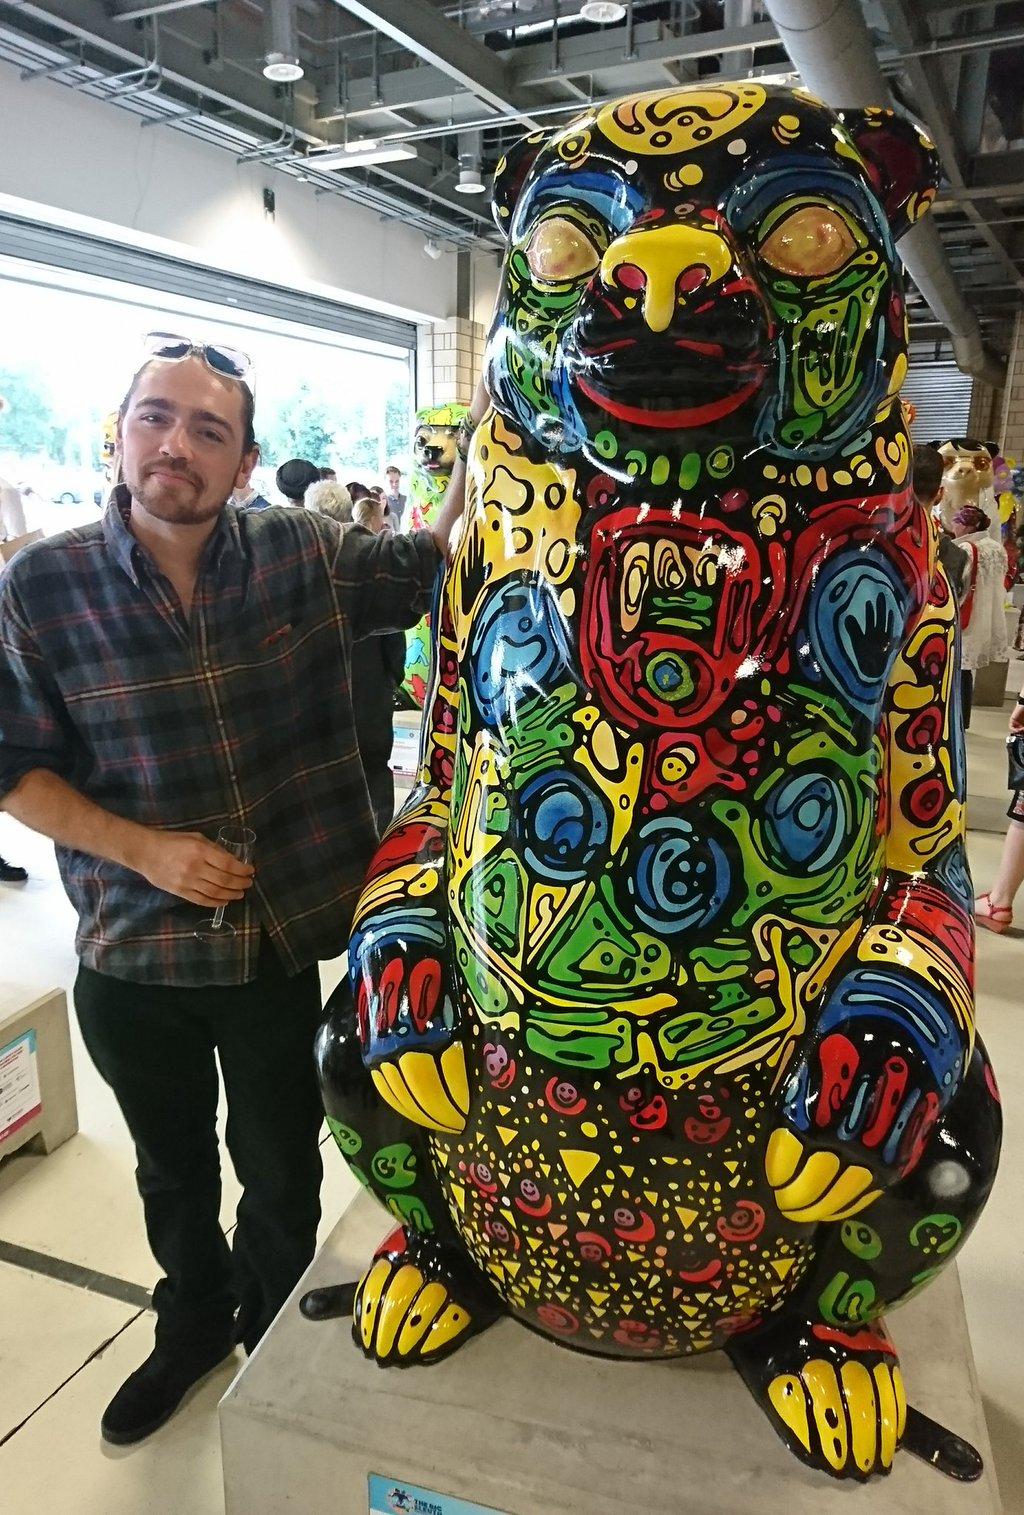 Bear and Artist